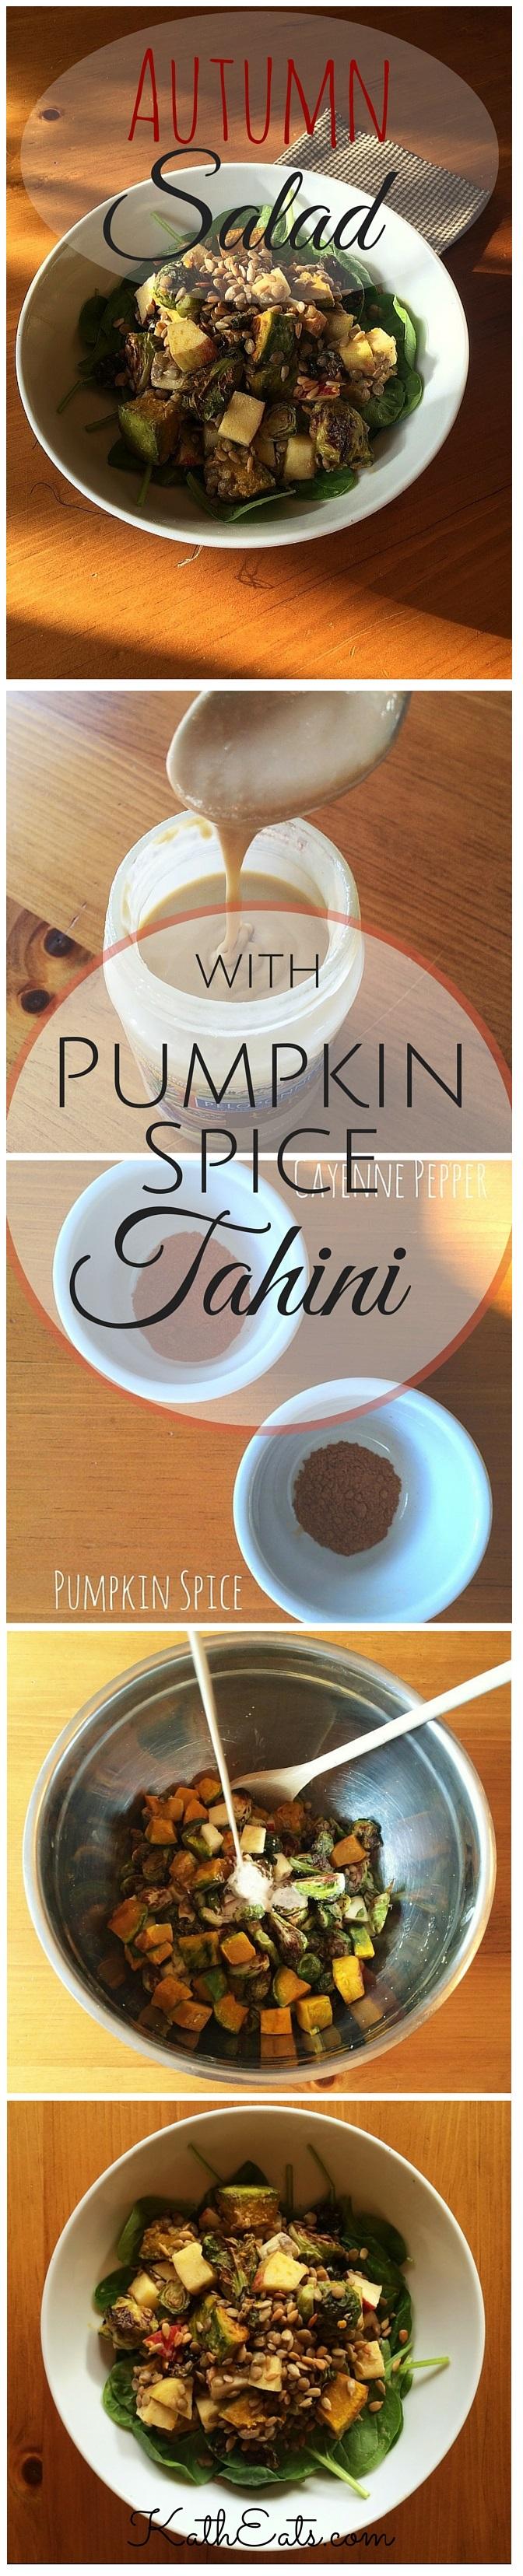 Autumn Salad with Pumpkin Spice Tahini Pin